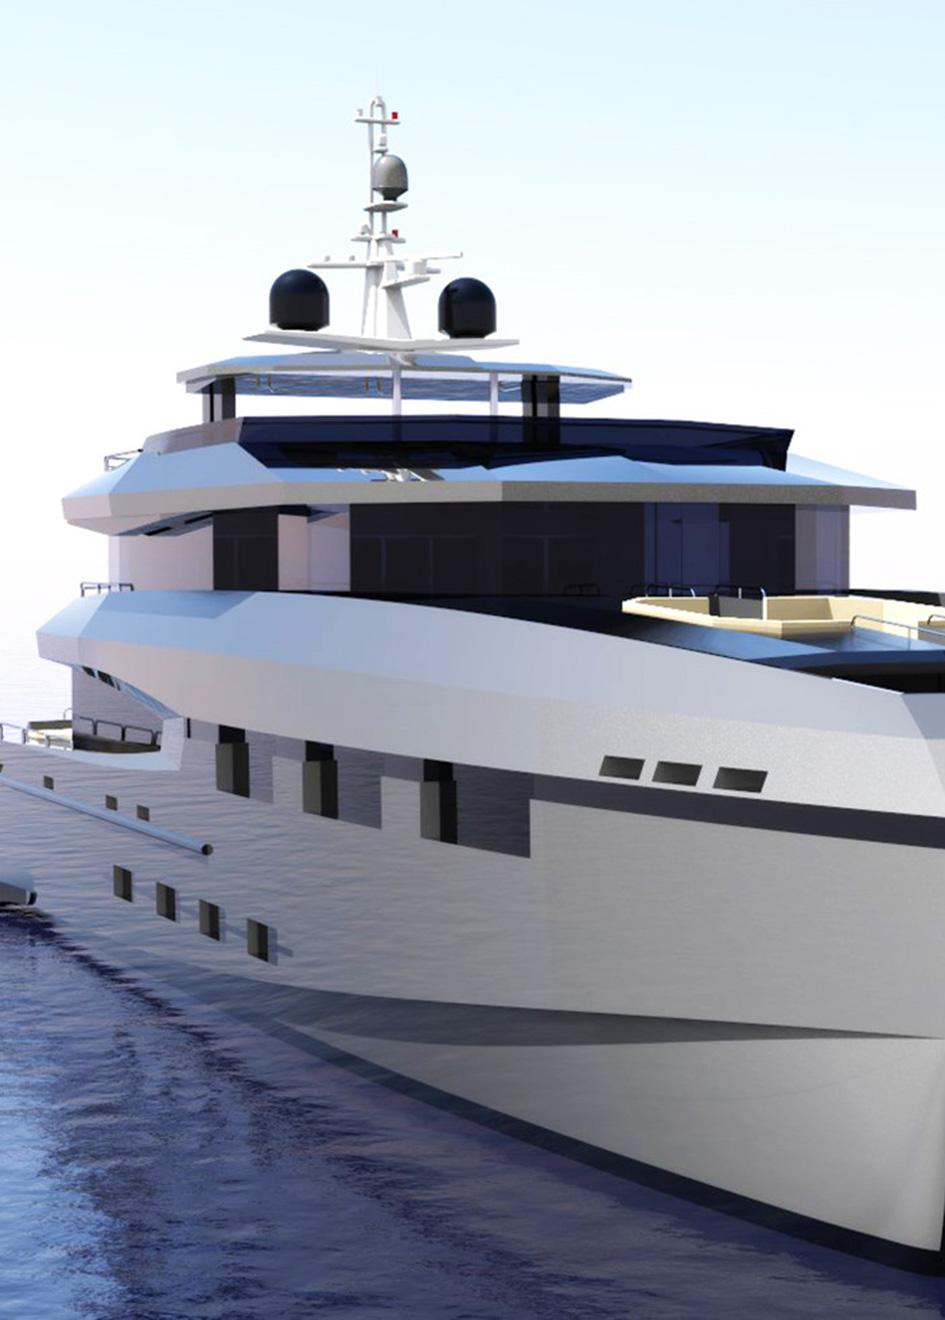 the-superstructure-of-the-heysea-135-vista-catamaran